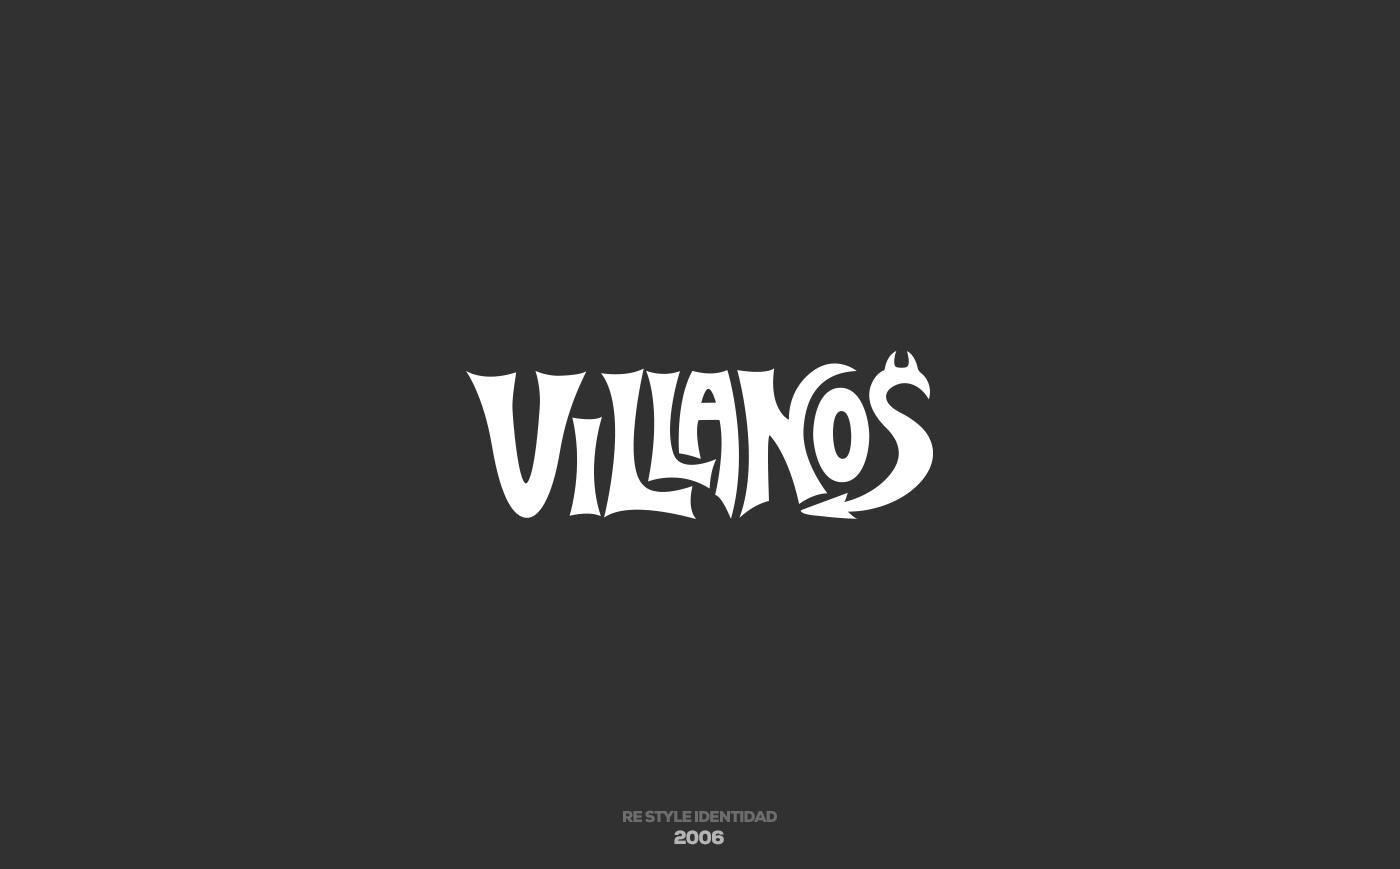 VILLANOS-RE-STYLE-LOGOTIPO-2006-KUCHA-02